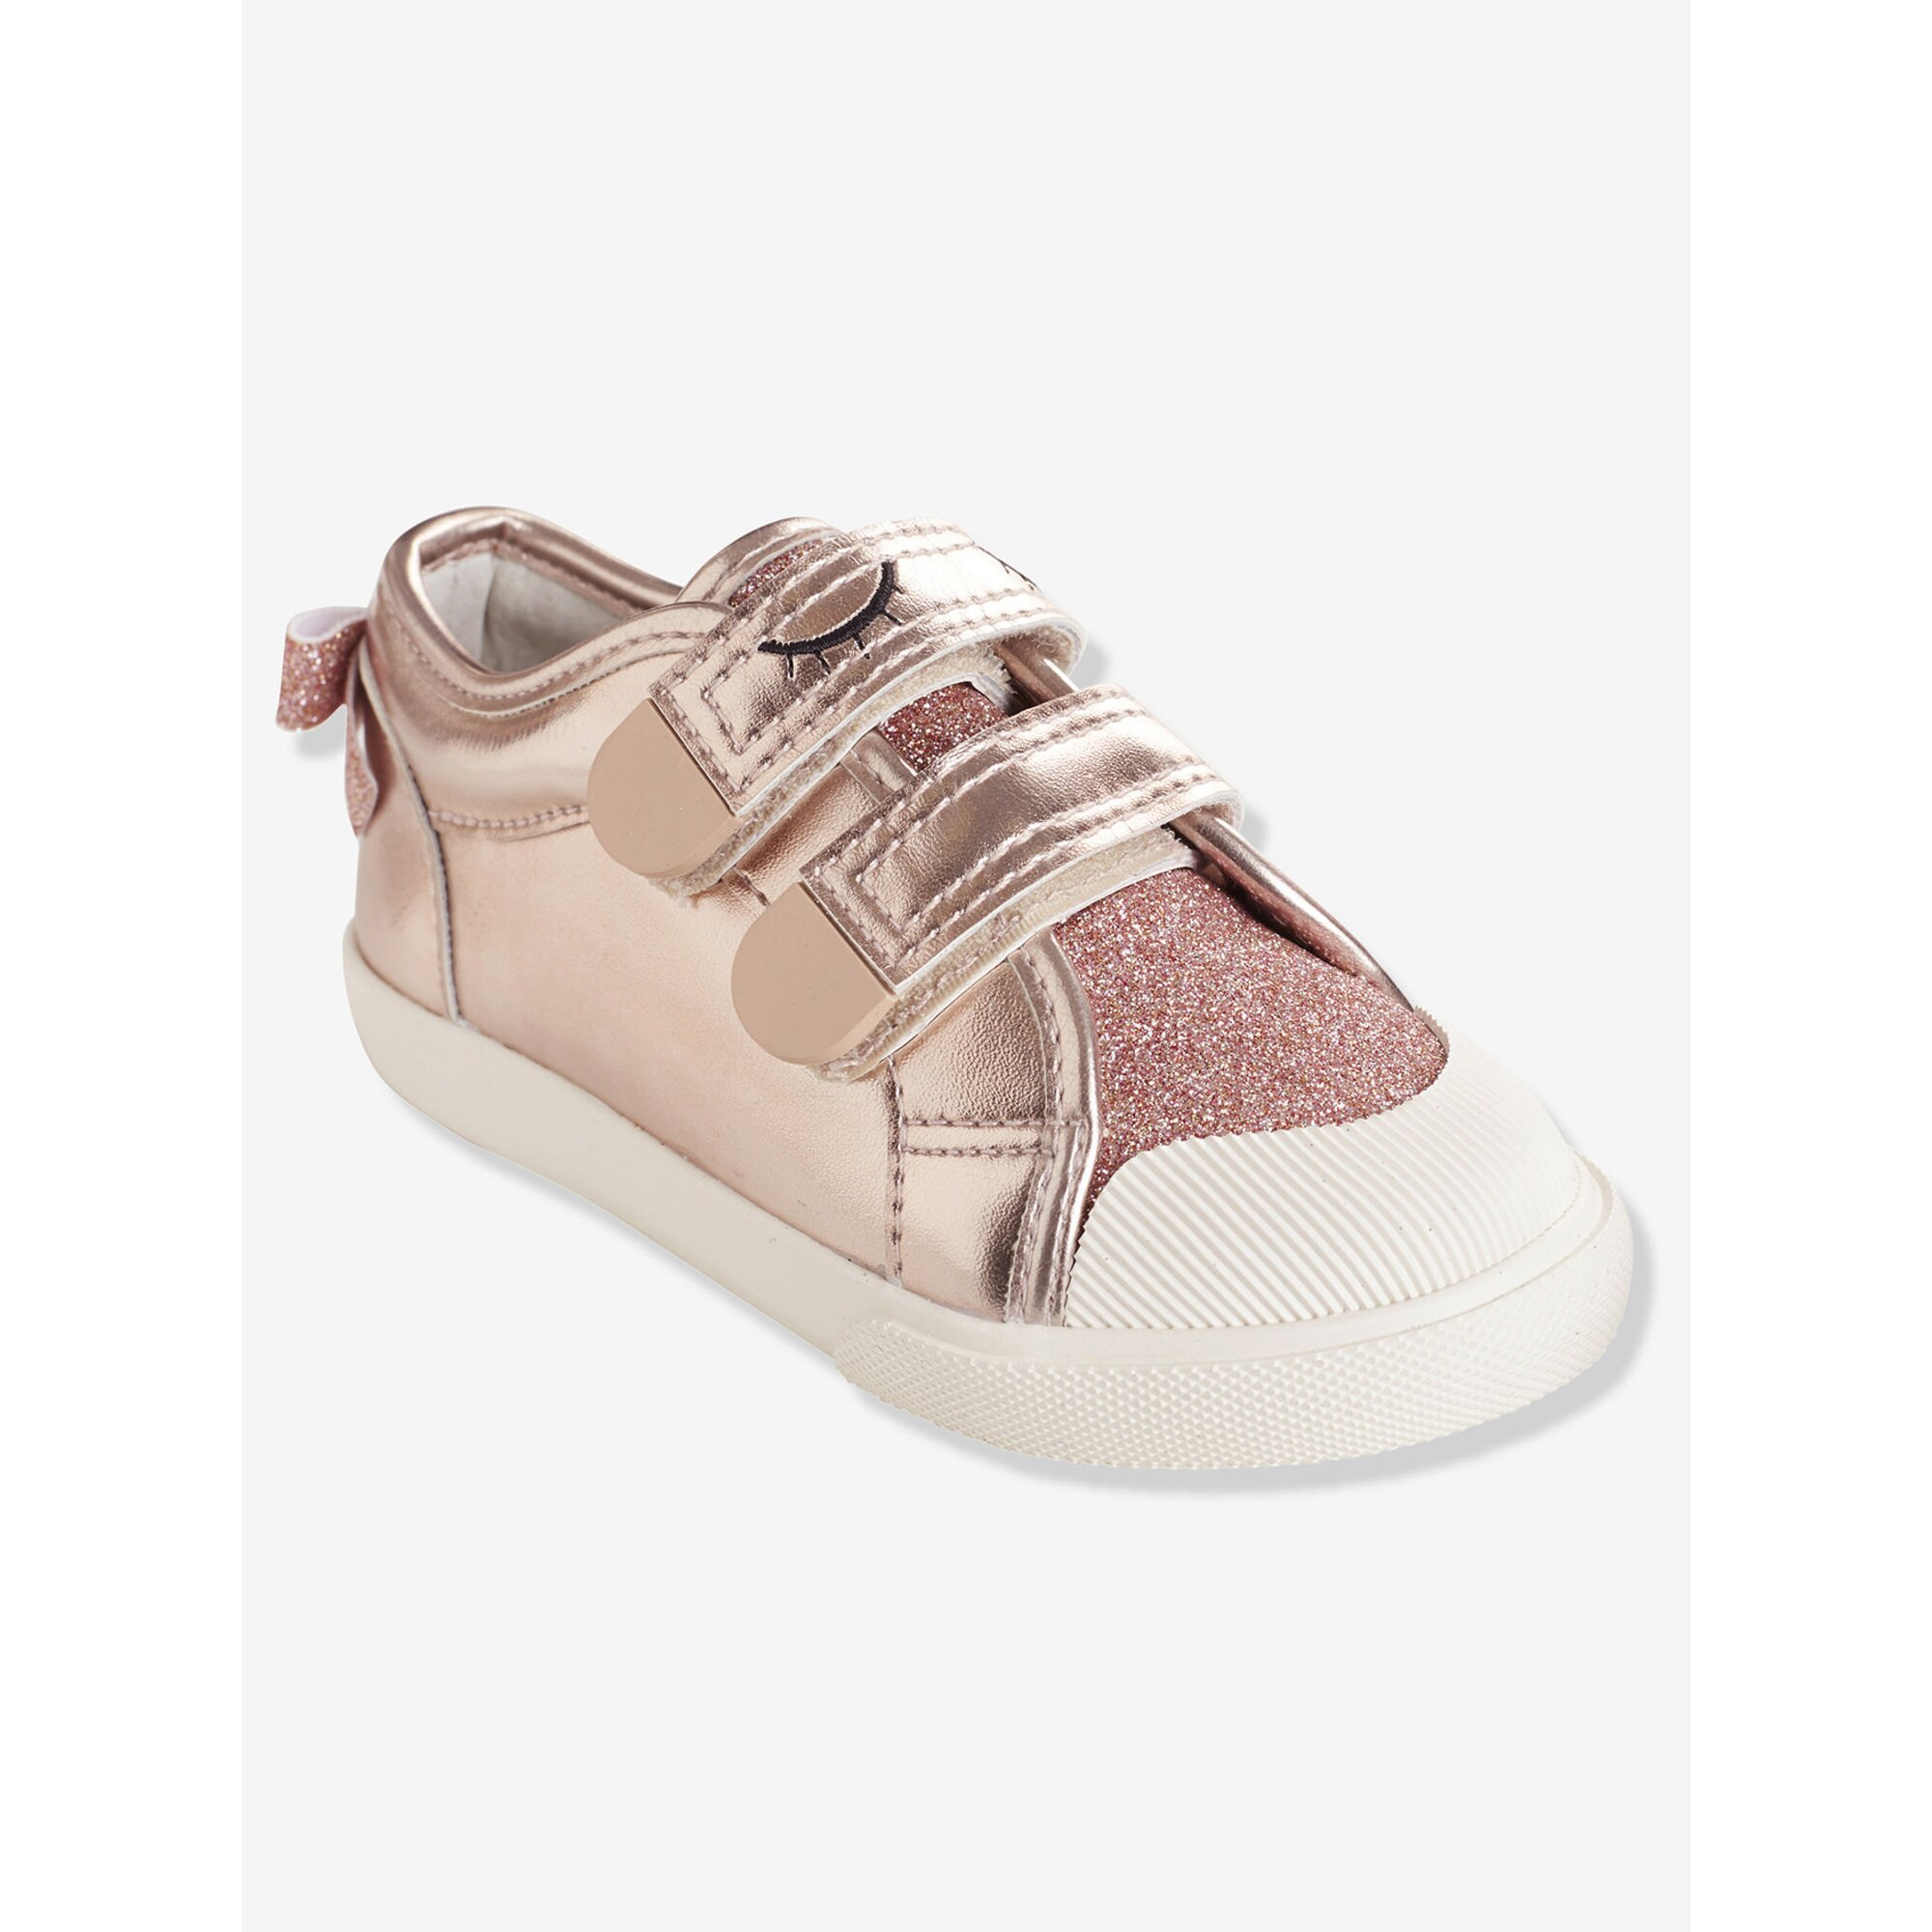 vertbaudet-klett-sneakers-madchen-anziehtrick, 35.99 EUR @ babywalz-de